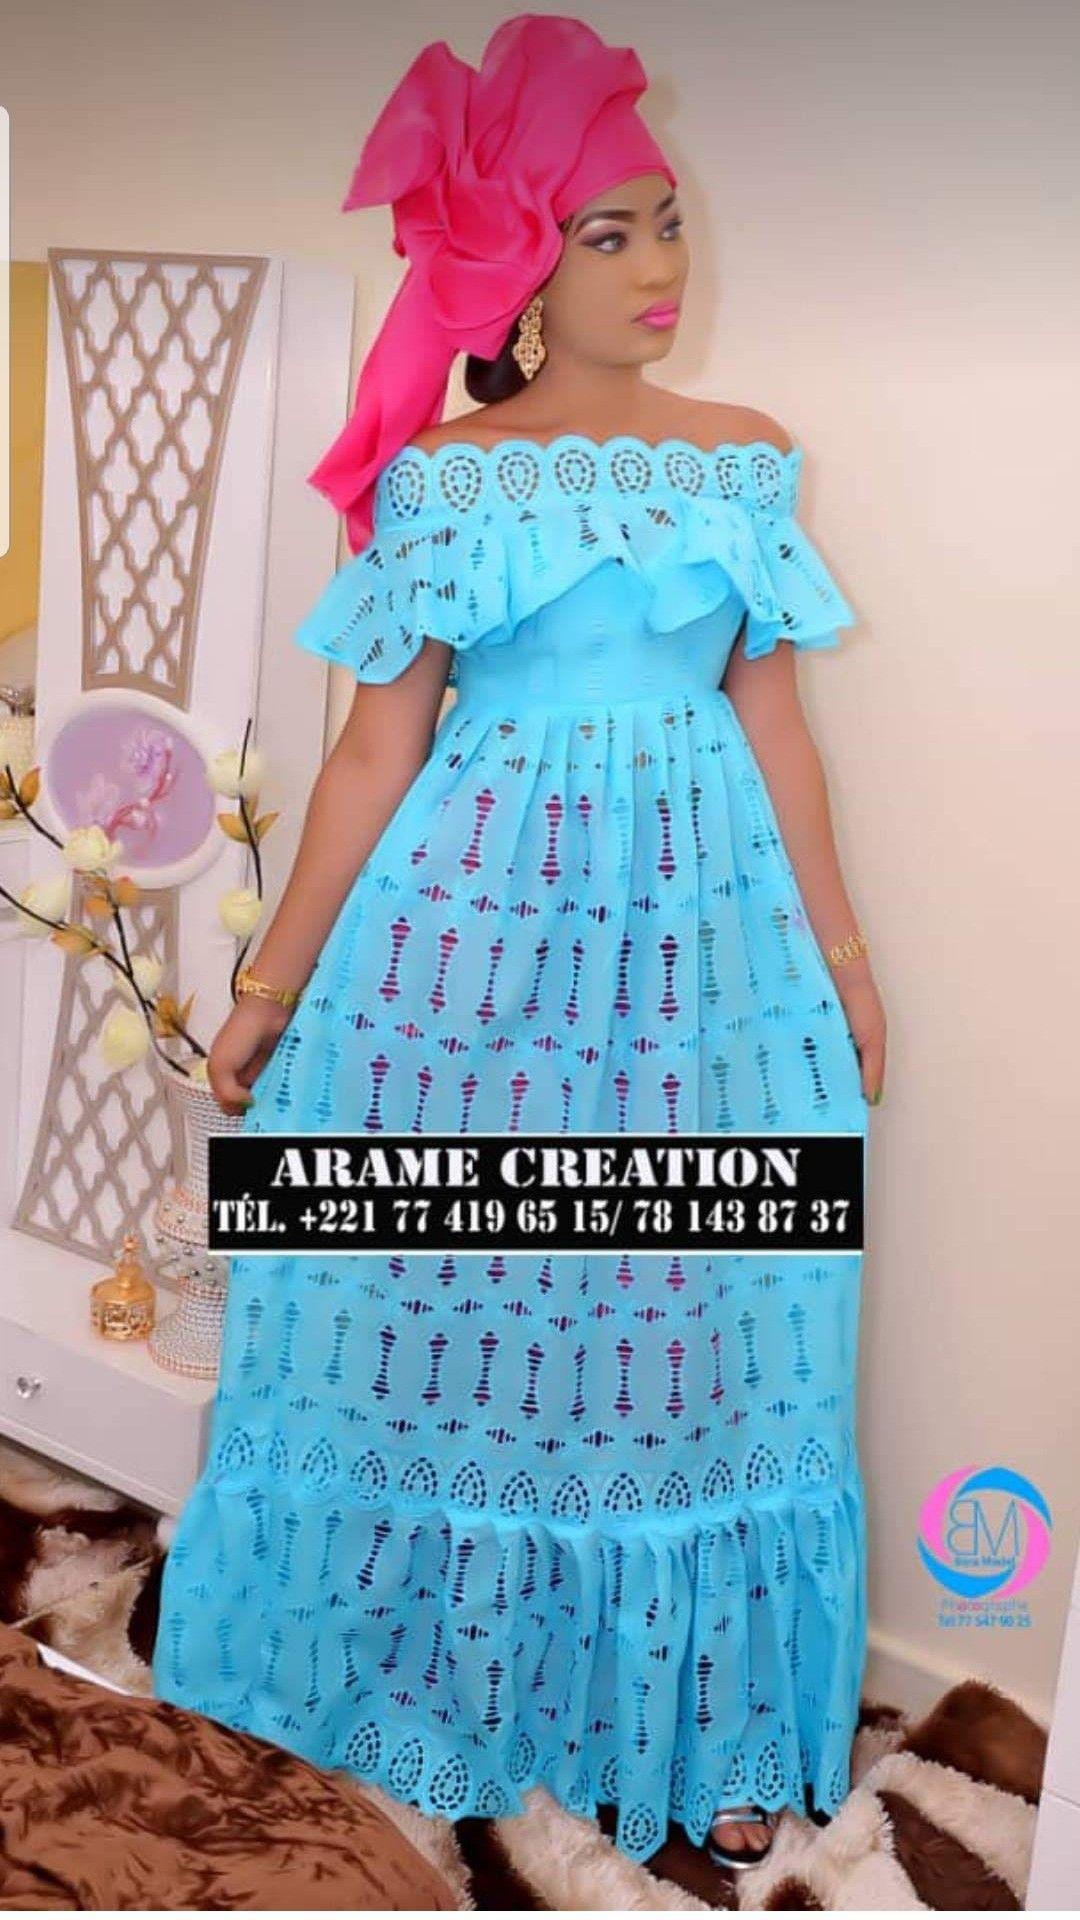 ModèleMode AfricaineAfricaine ModèleMode Robe En Senegalaise Robe Senegalaise AfricaineAfricaine Y6y7gfbv